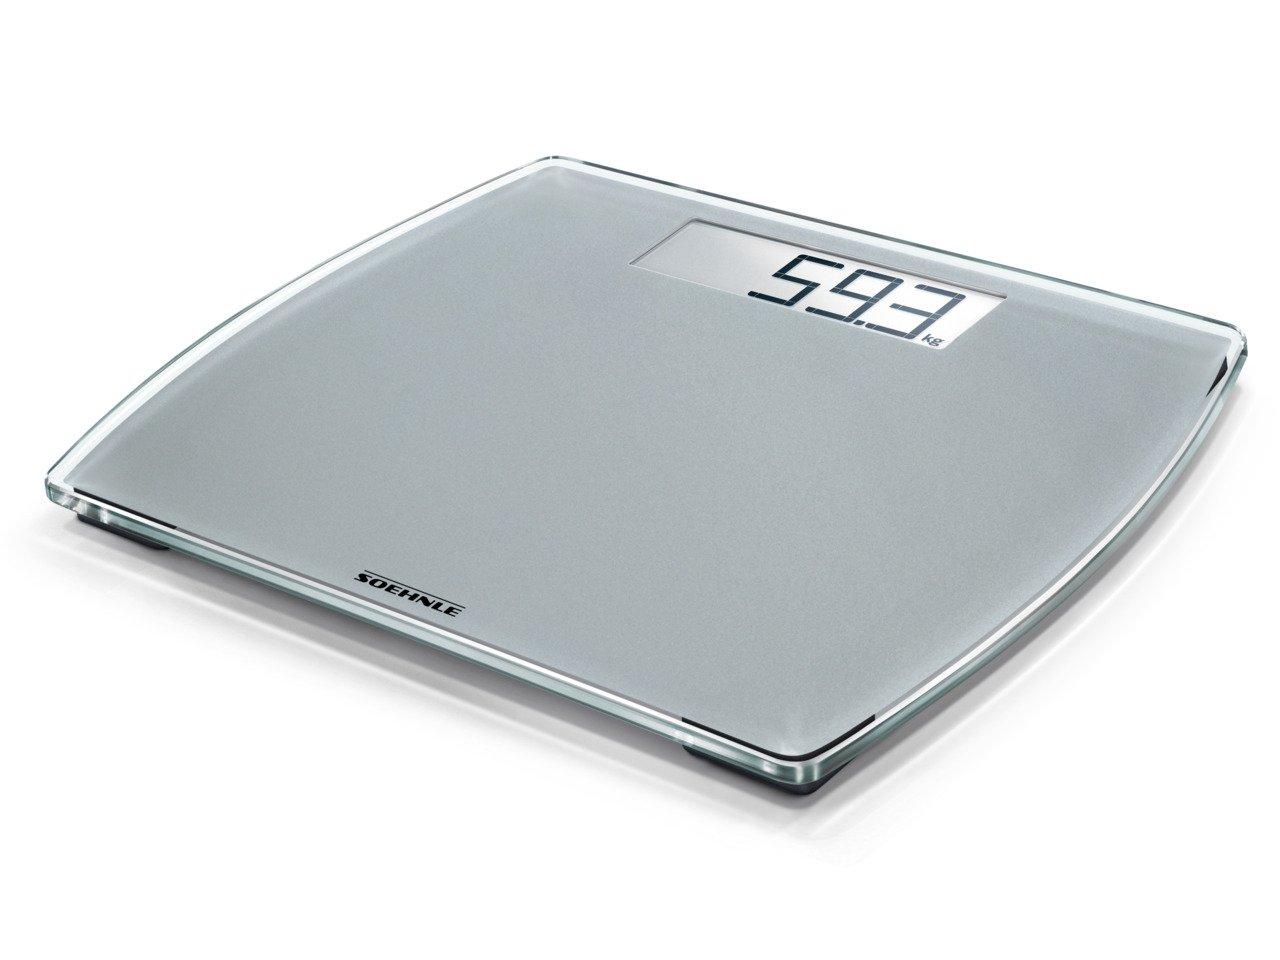 Soehnle Style Sense Comfort Electronic Bathroom Scale - 100 Scale, White 63853